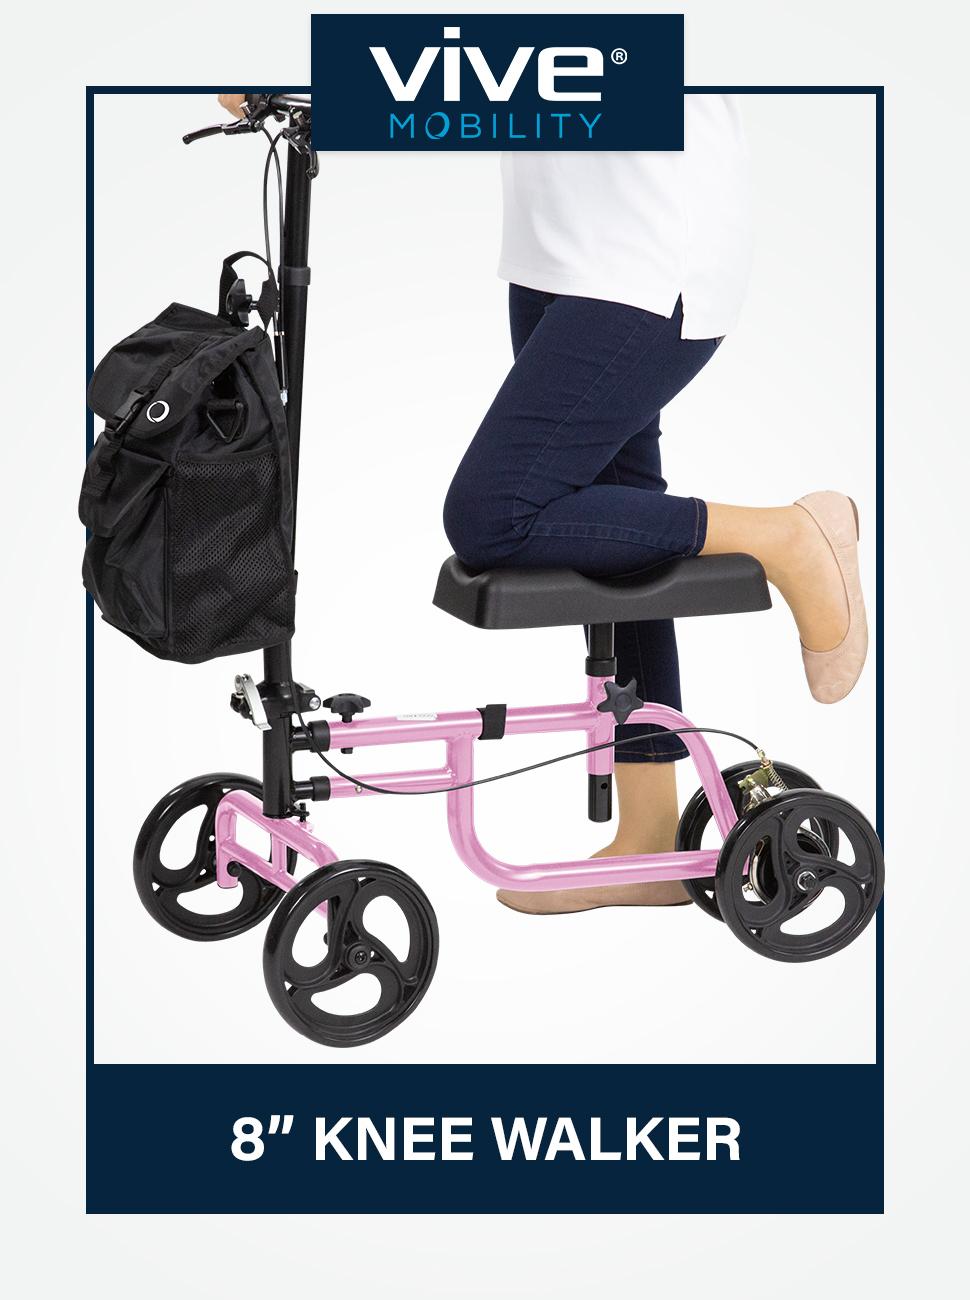 Vive Mobility Knee Walker Steerable Scooter Broken Leg, Foot, Ankle Injuries - Kneeling Quad Roller